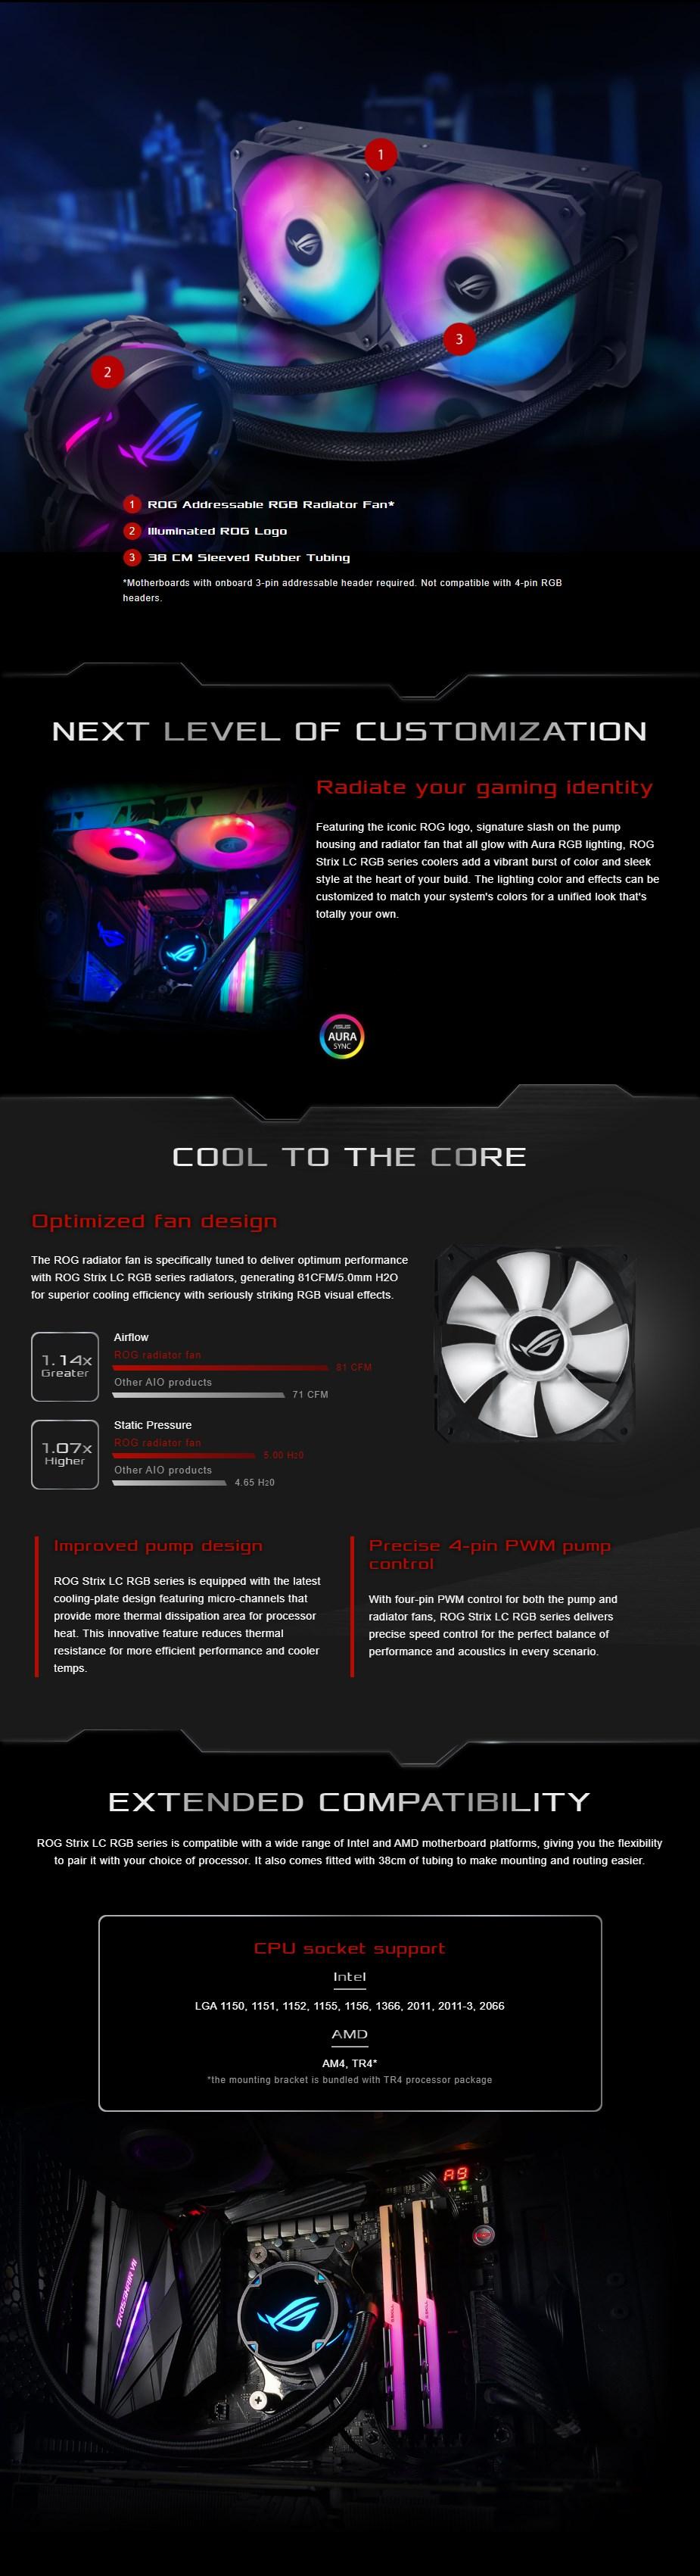 asus-rog-strix-lc-240-rgb-aio-liquid-cpu-cooler-ac28522-2.jpg